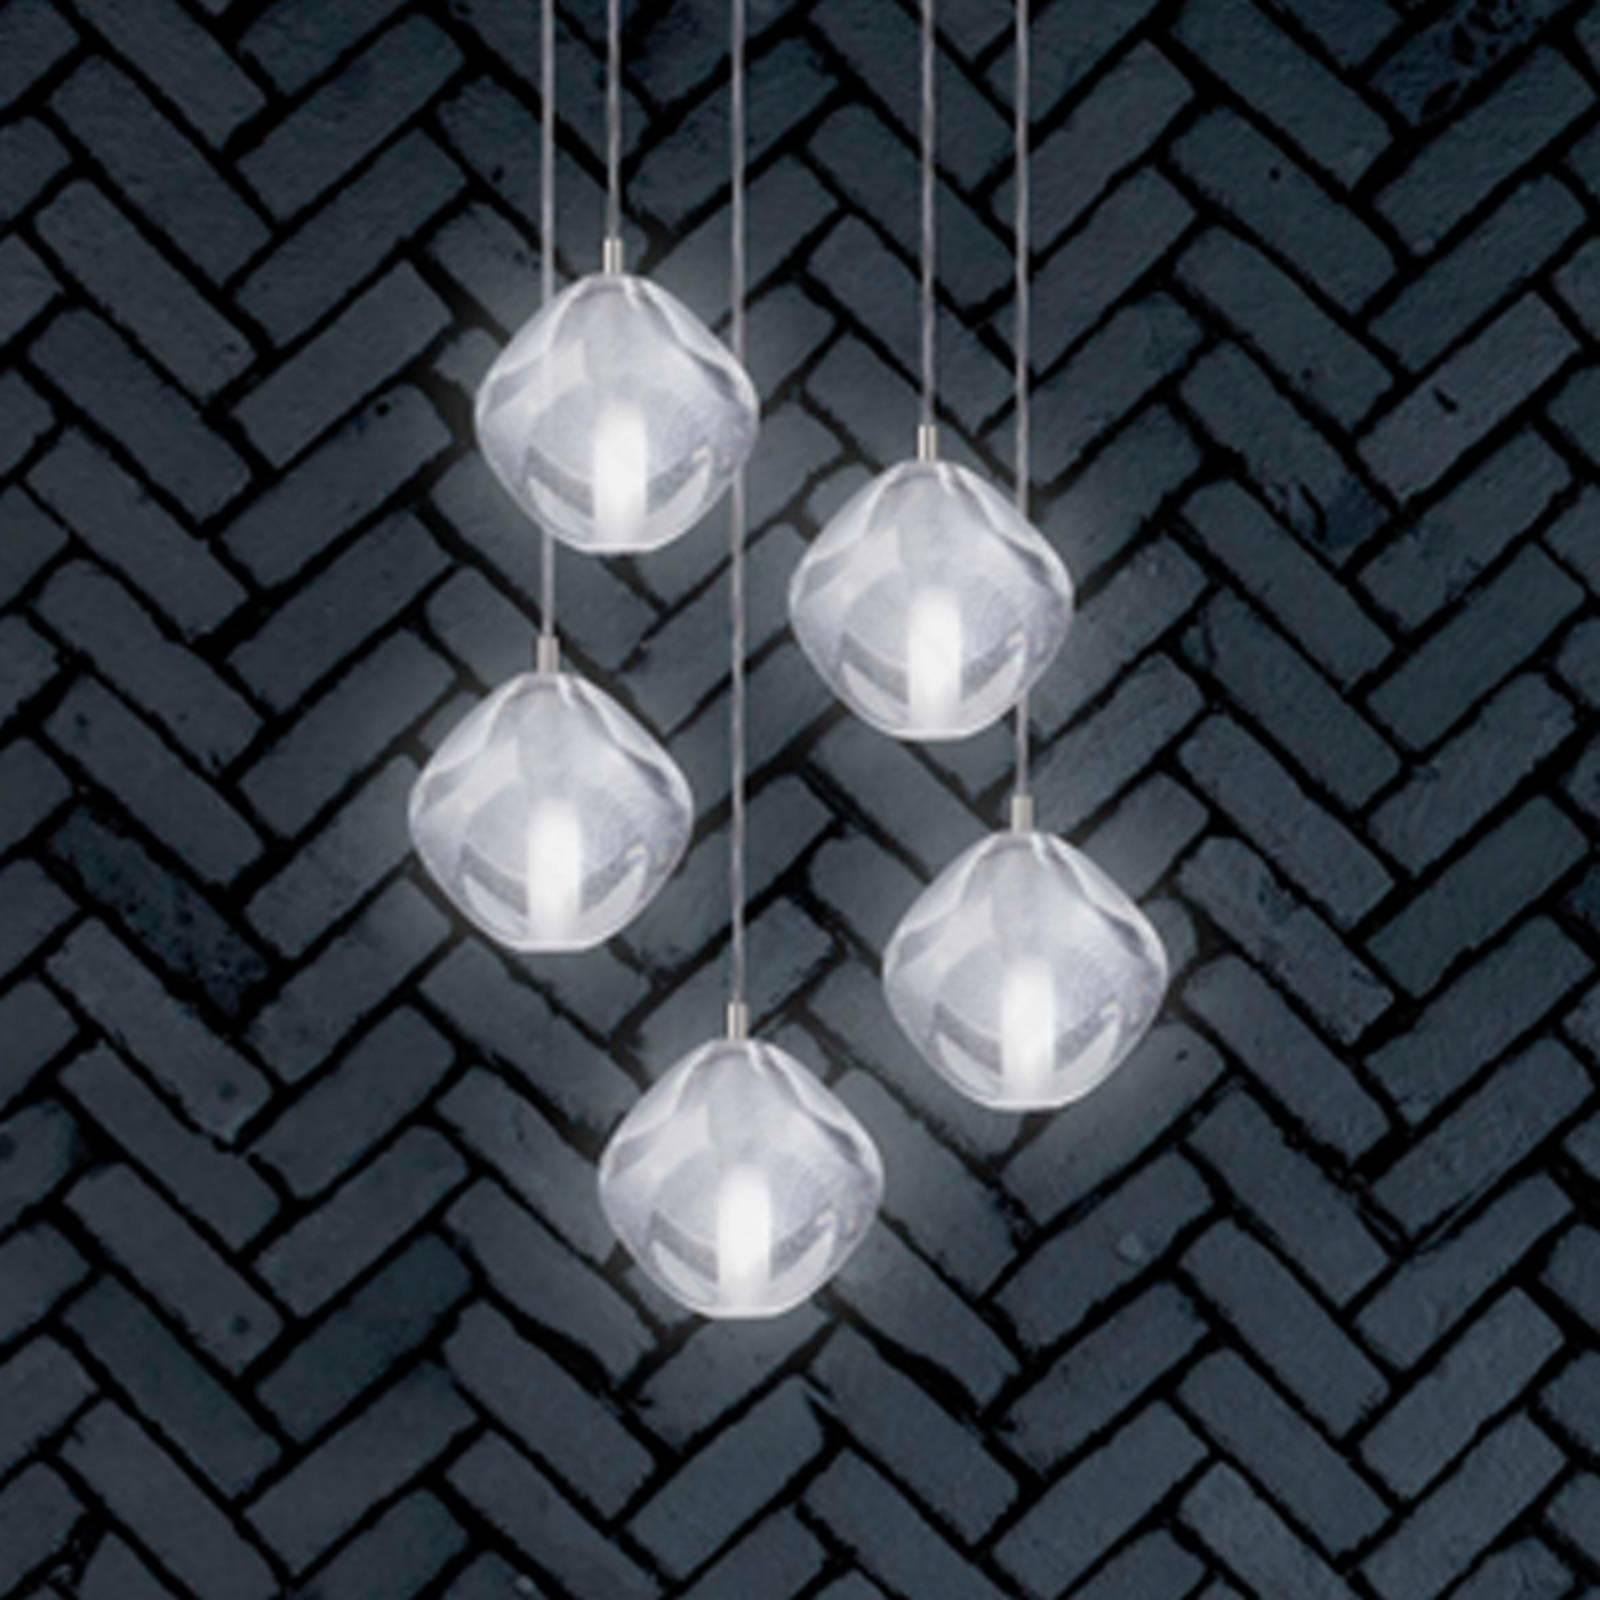 Hanglamp Glace van glas, 5-lamps